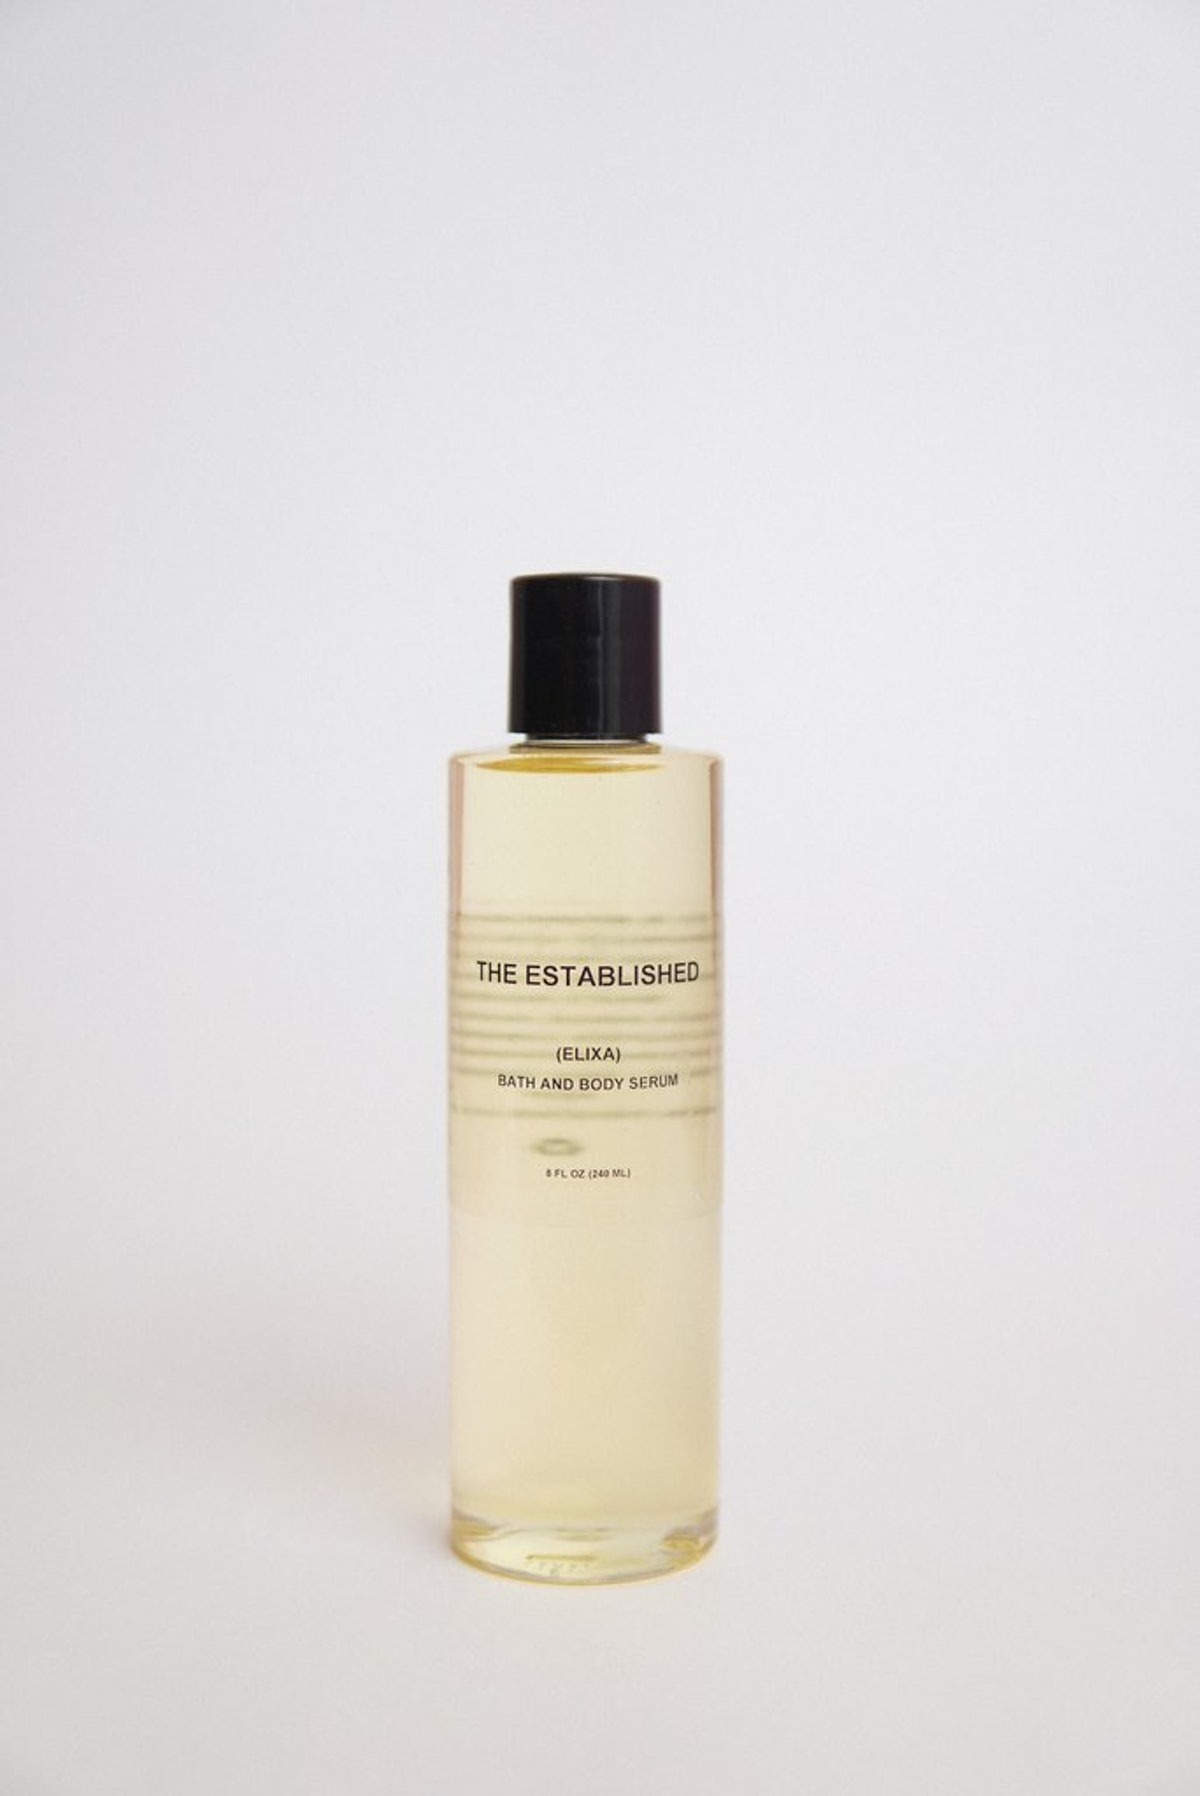 Elixa Bath And Body Serum